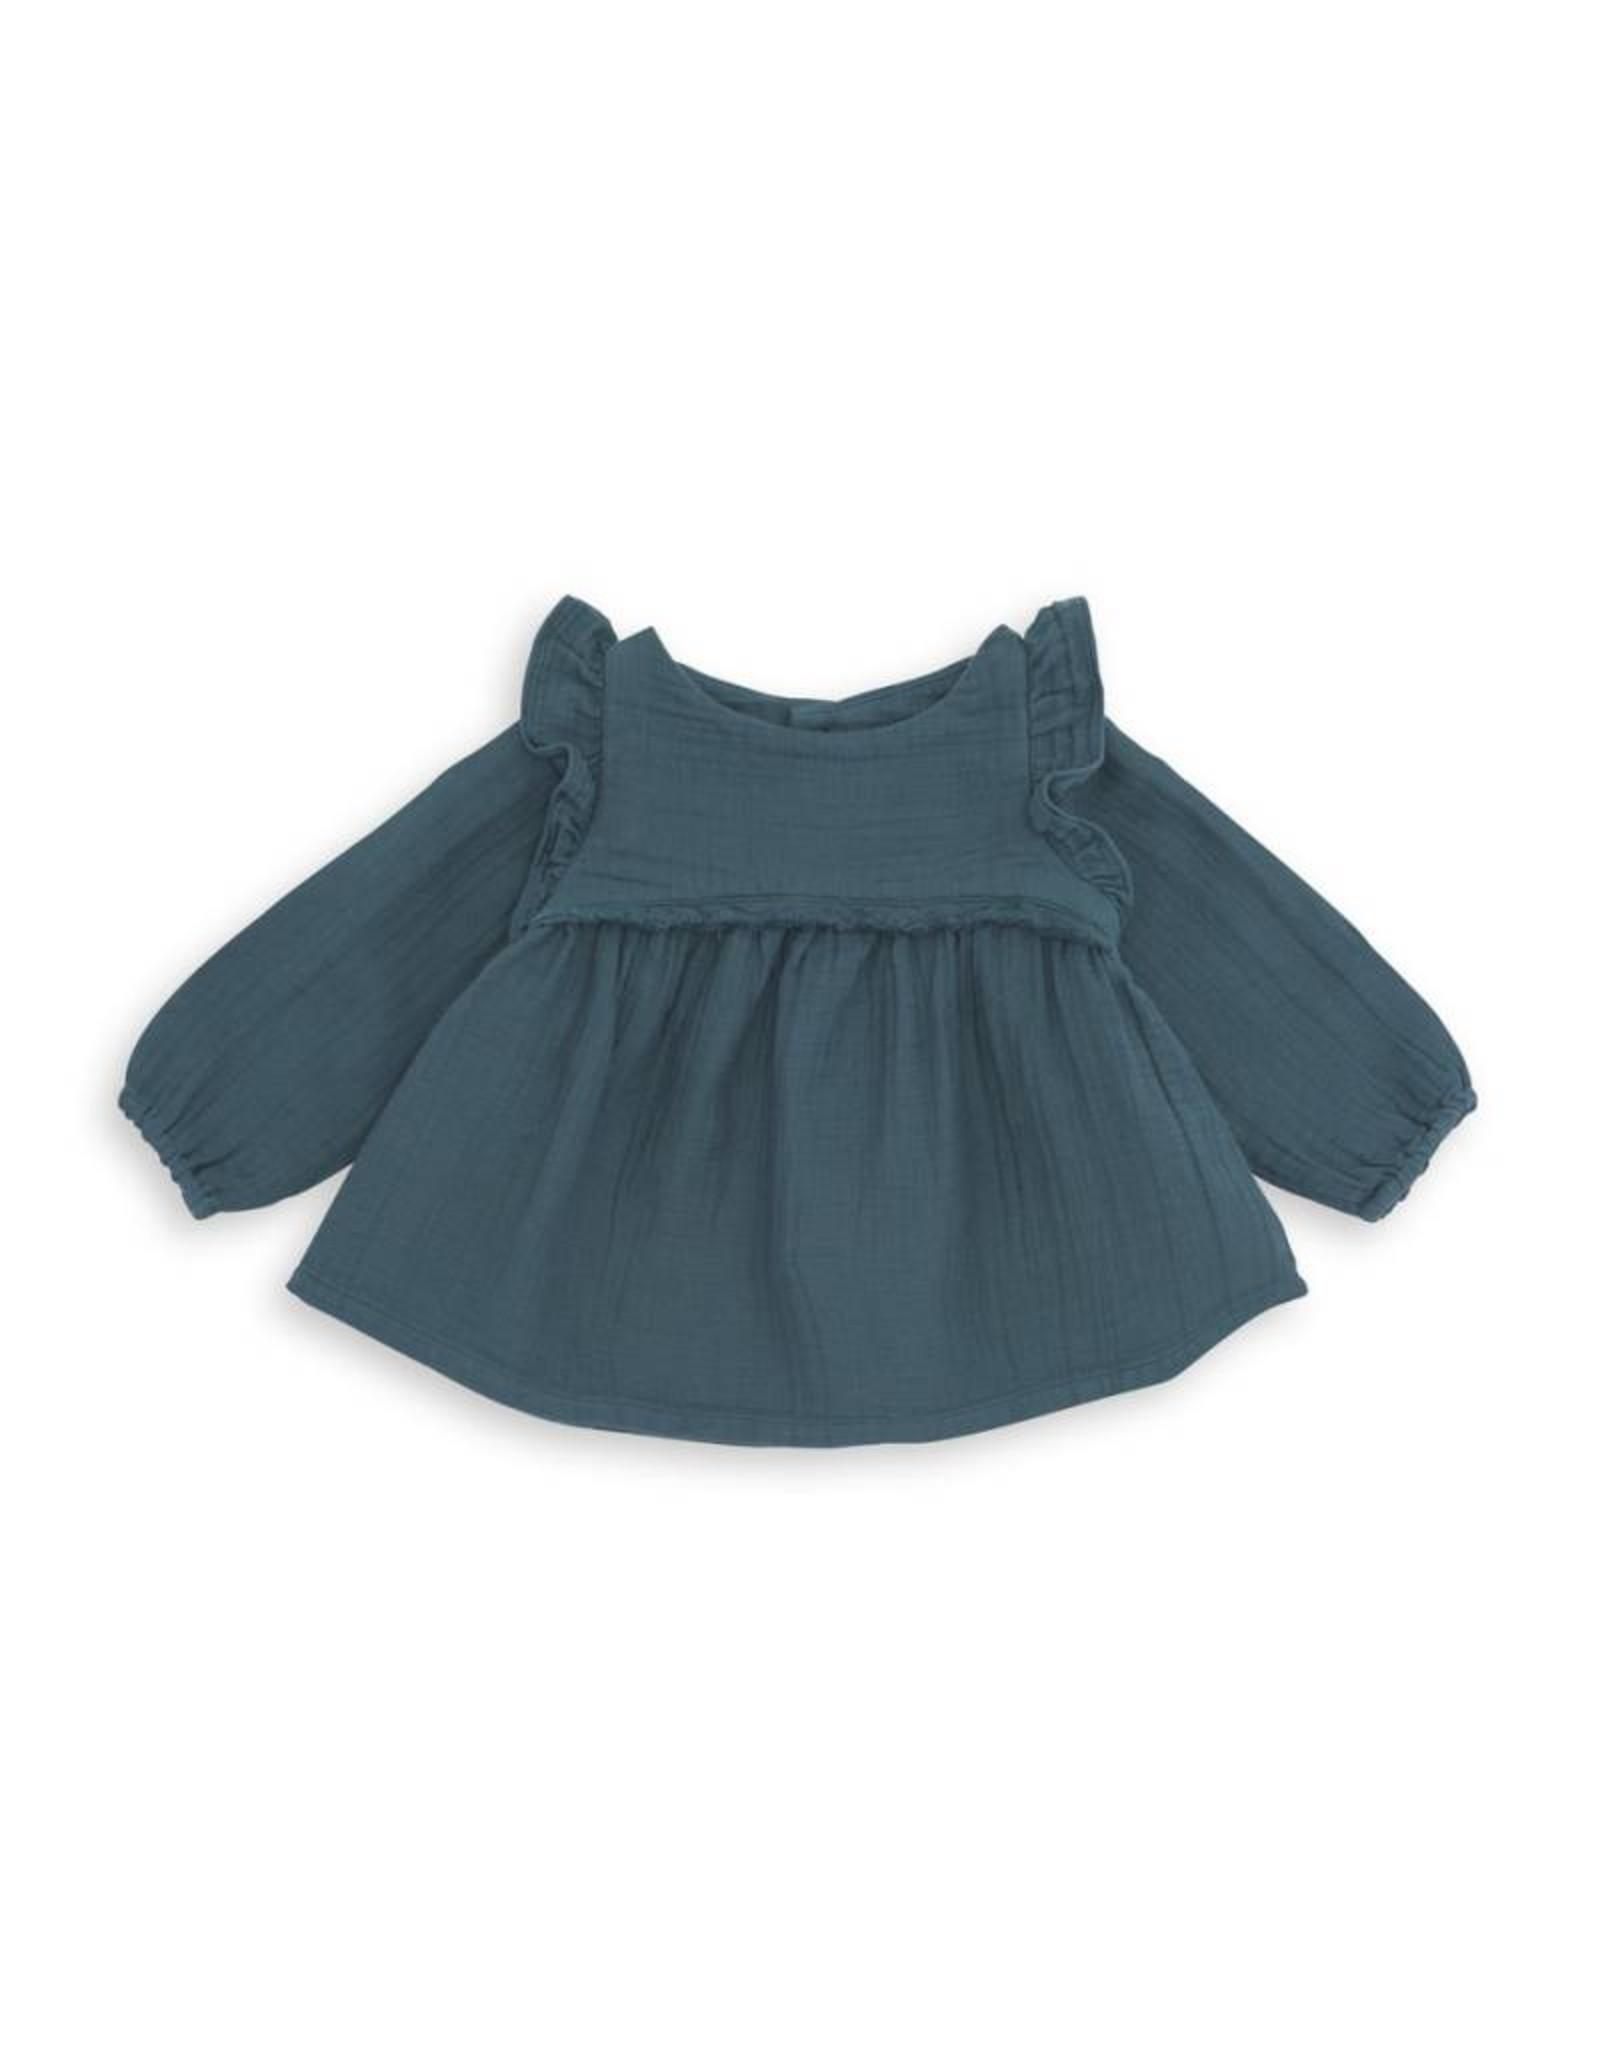 Bonton Baby Meca blouse